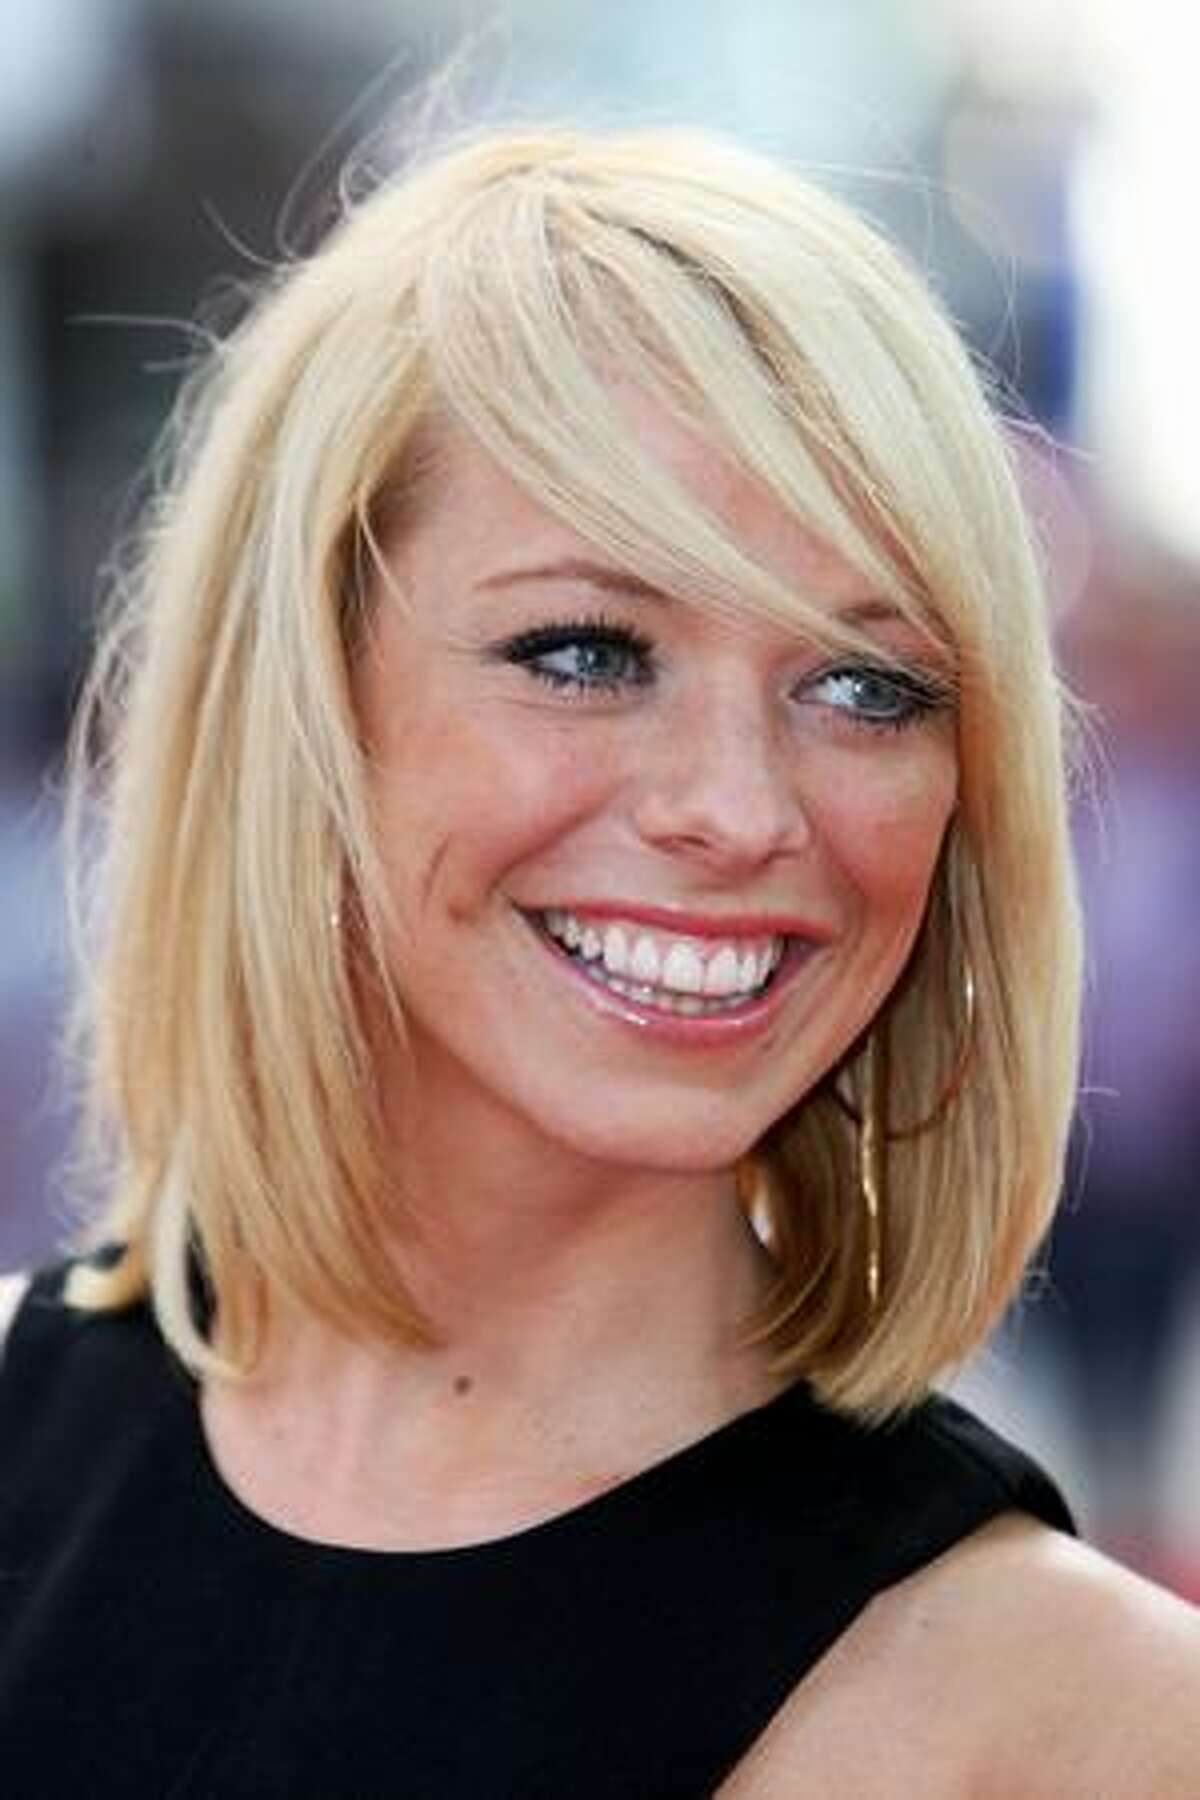 Singer Liz McClarnon attends the UK film premiere of